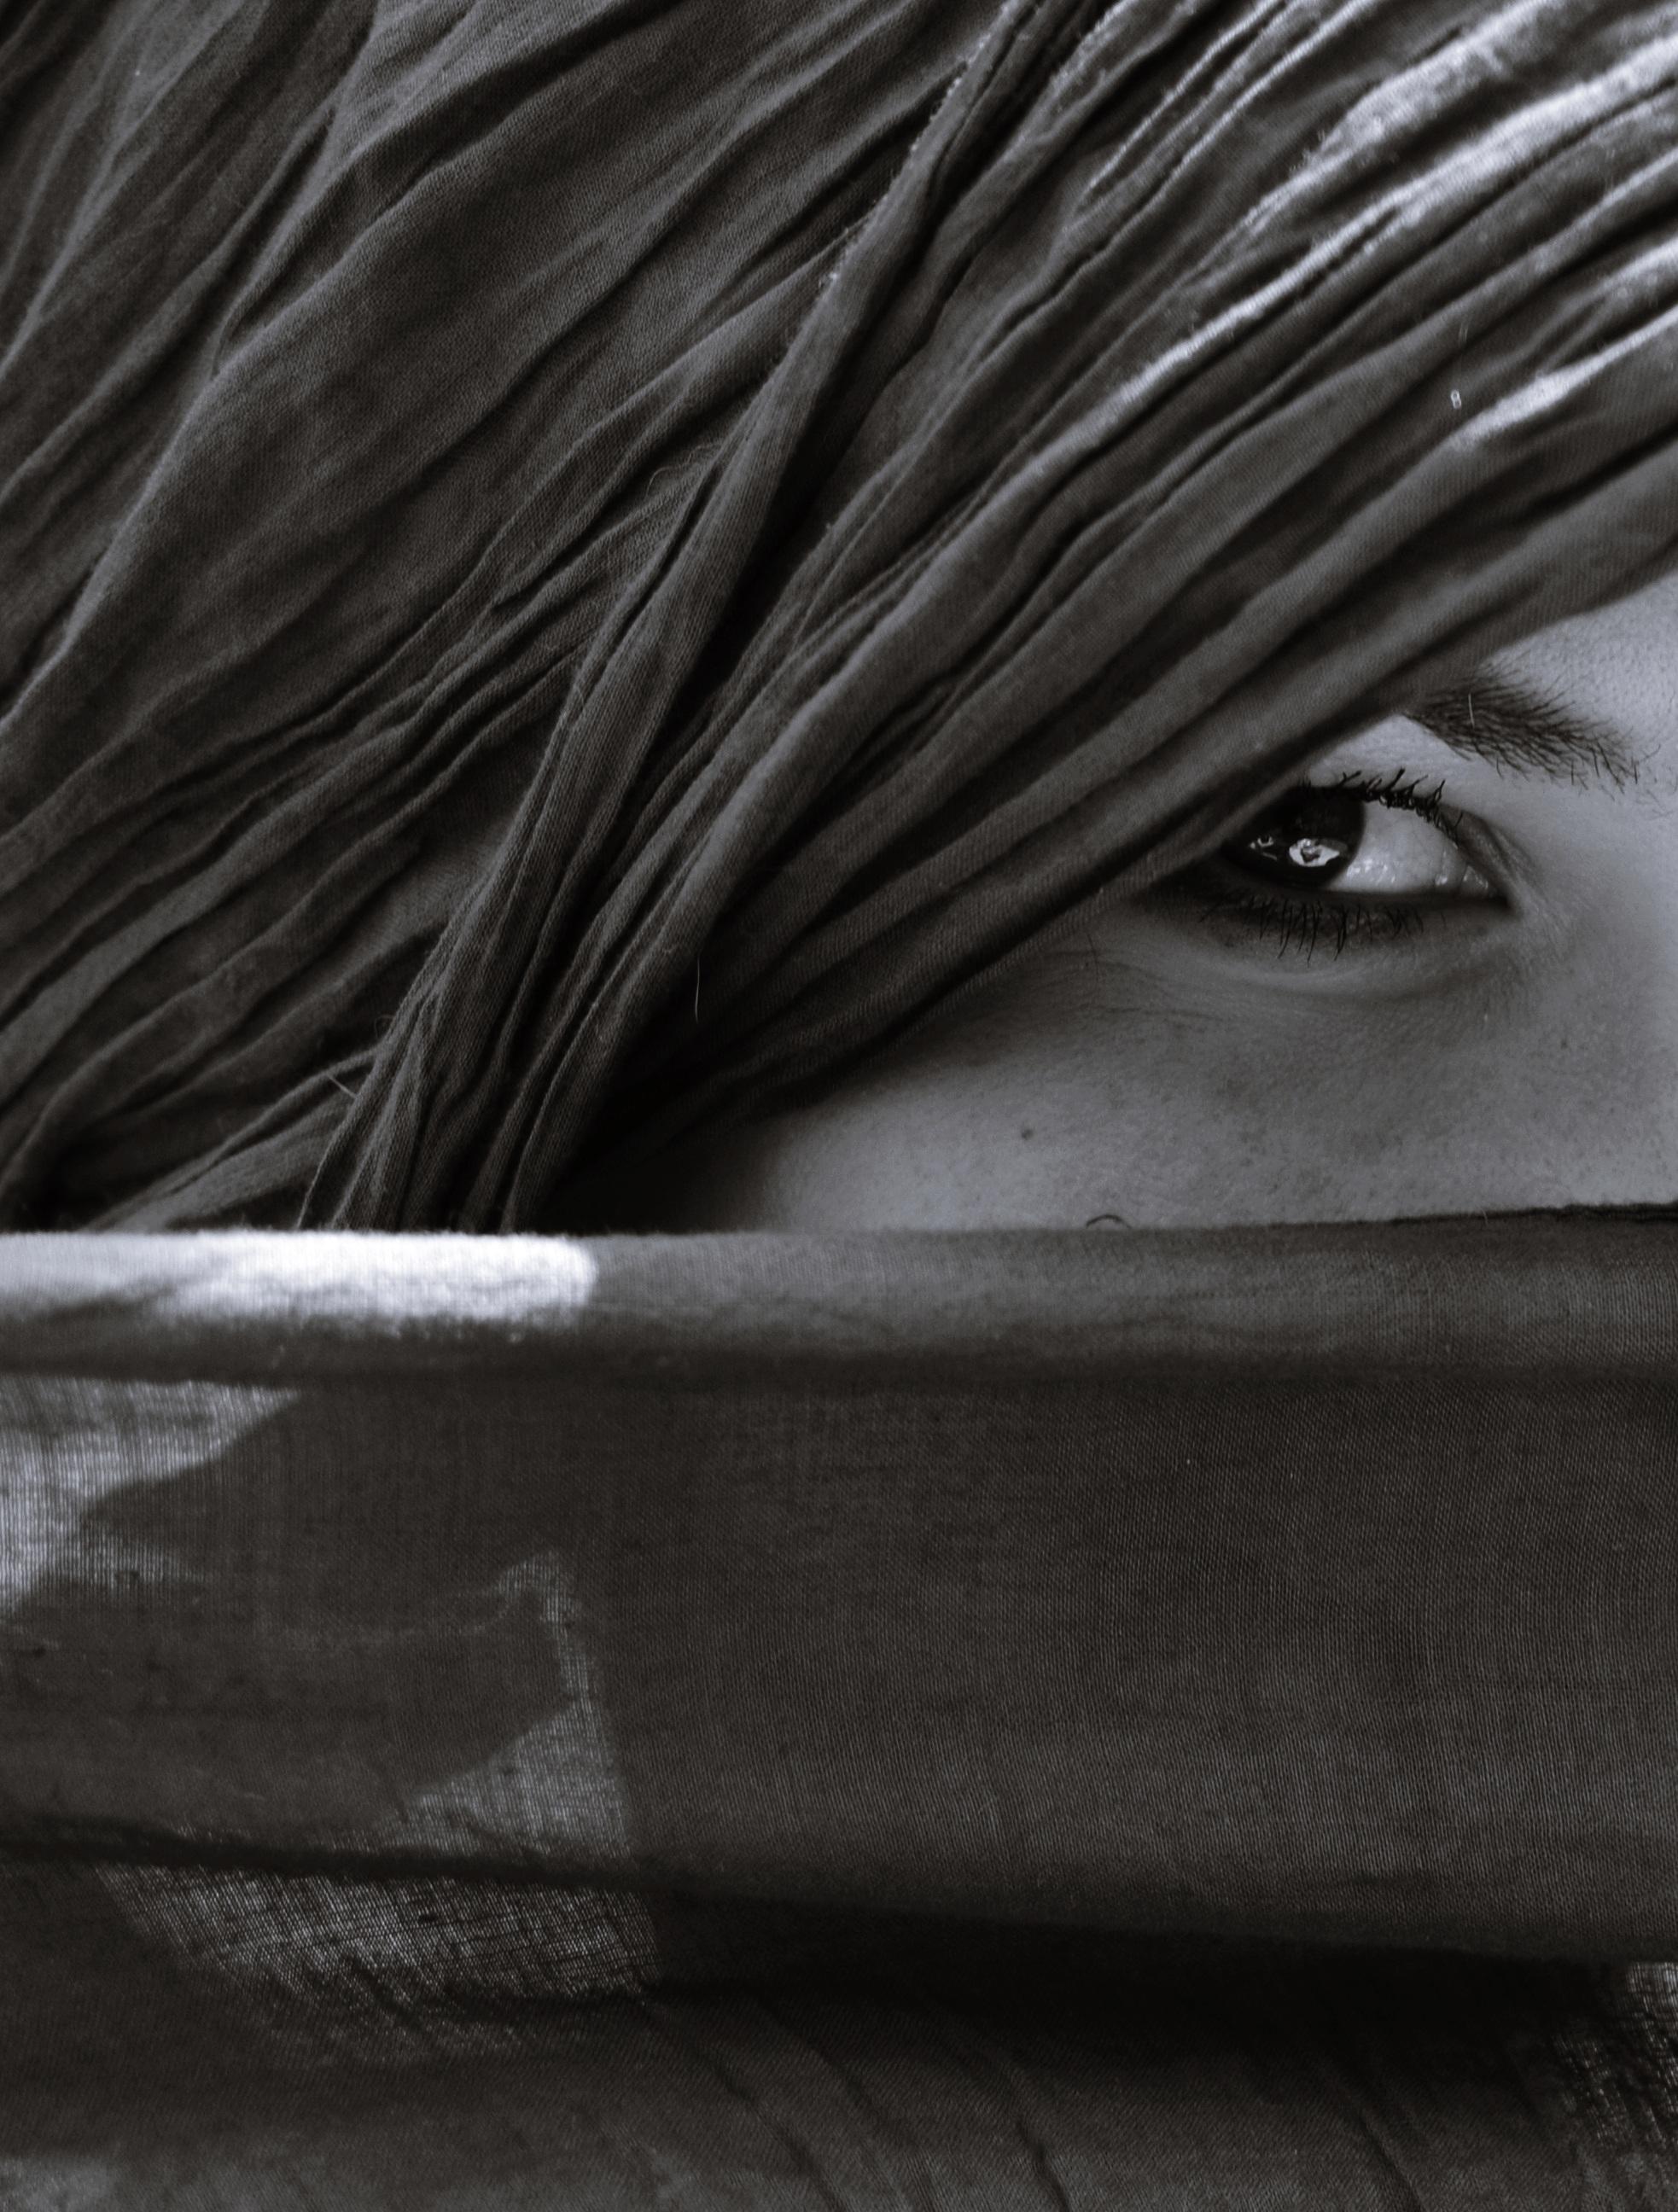 Gambar Hitam Dan Putih Gadis Wanita Kulit Bulu Coklat